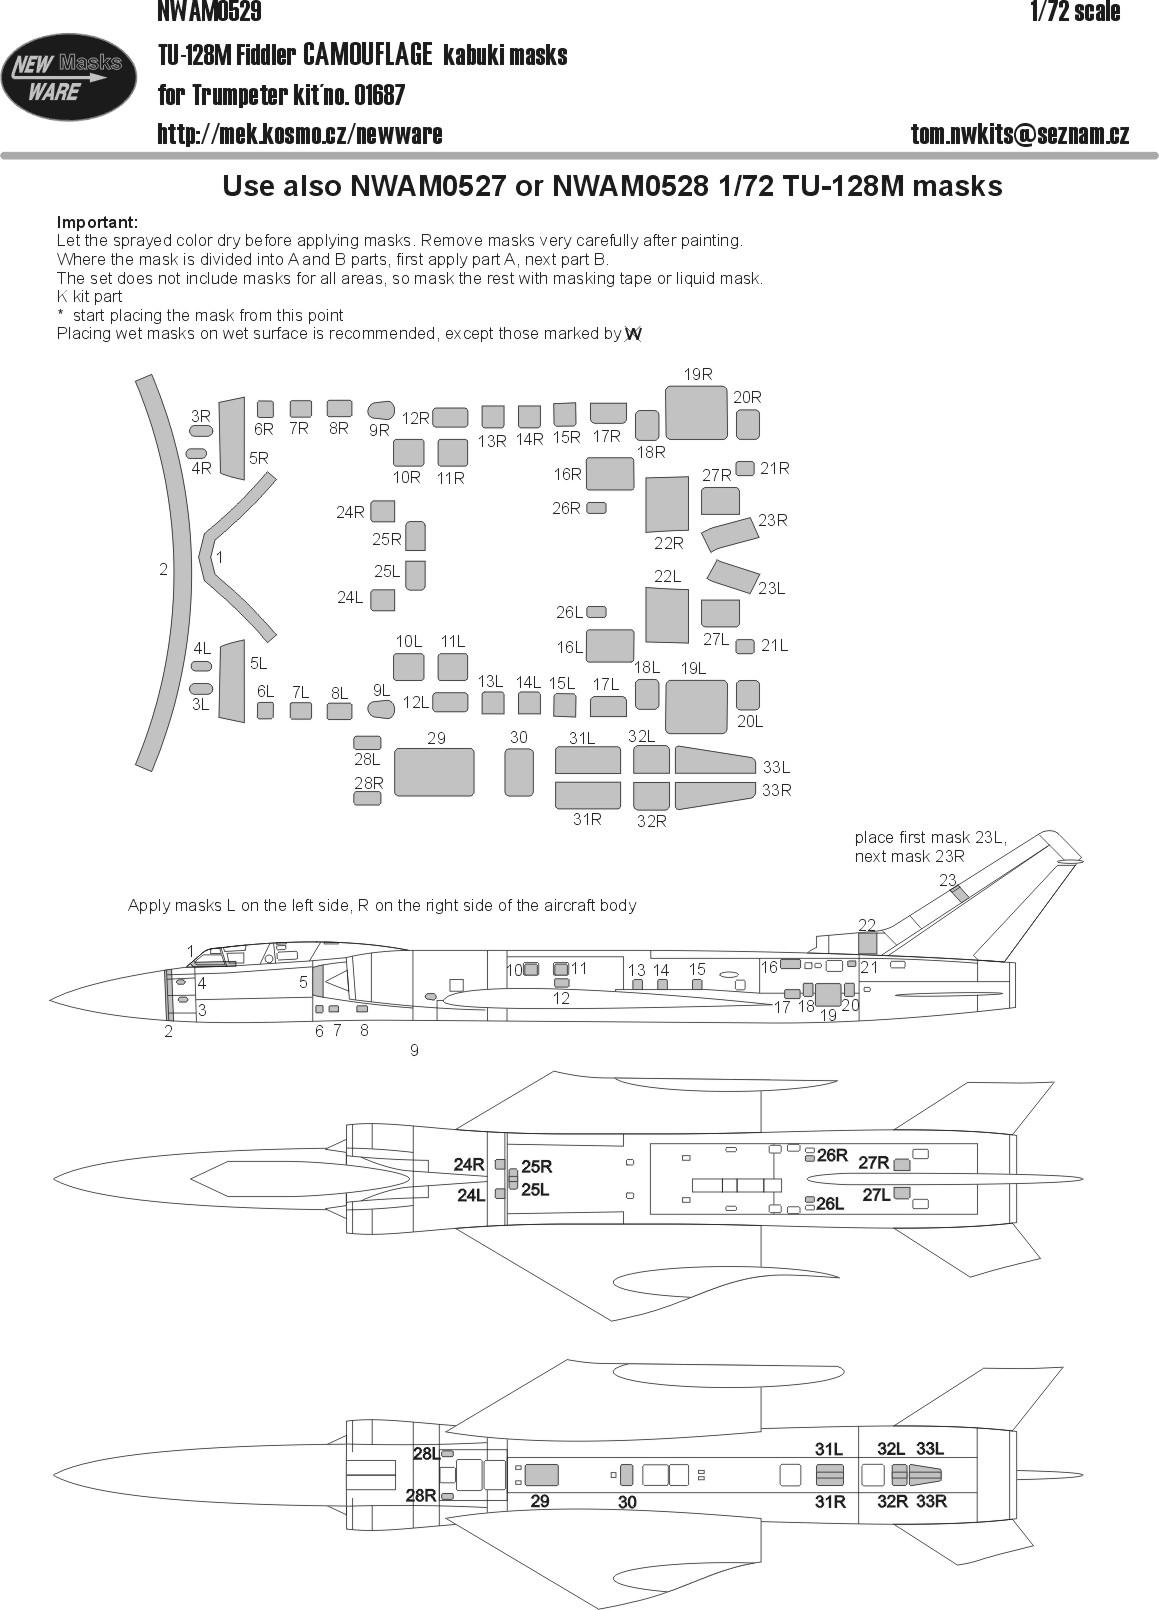 scala-15l schematic